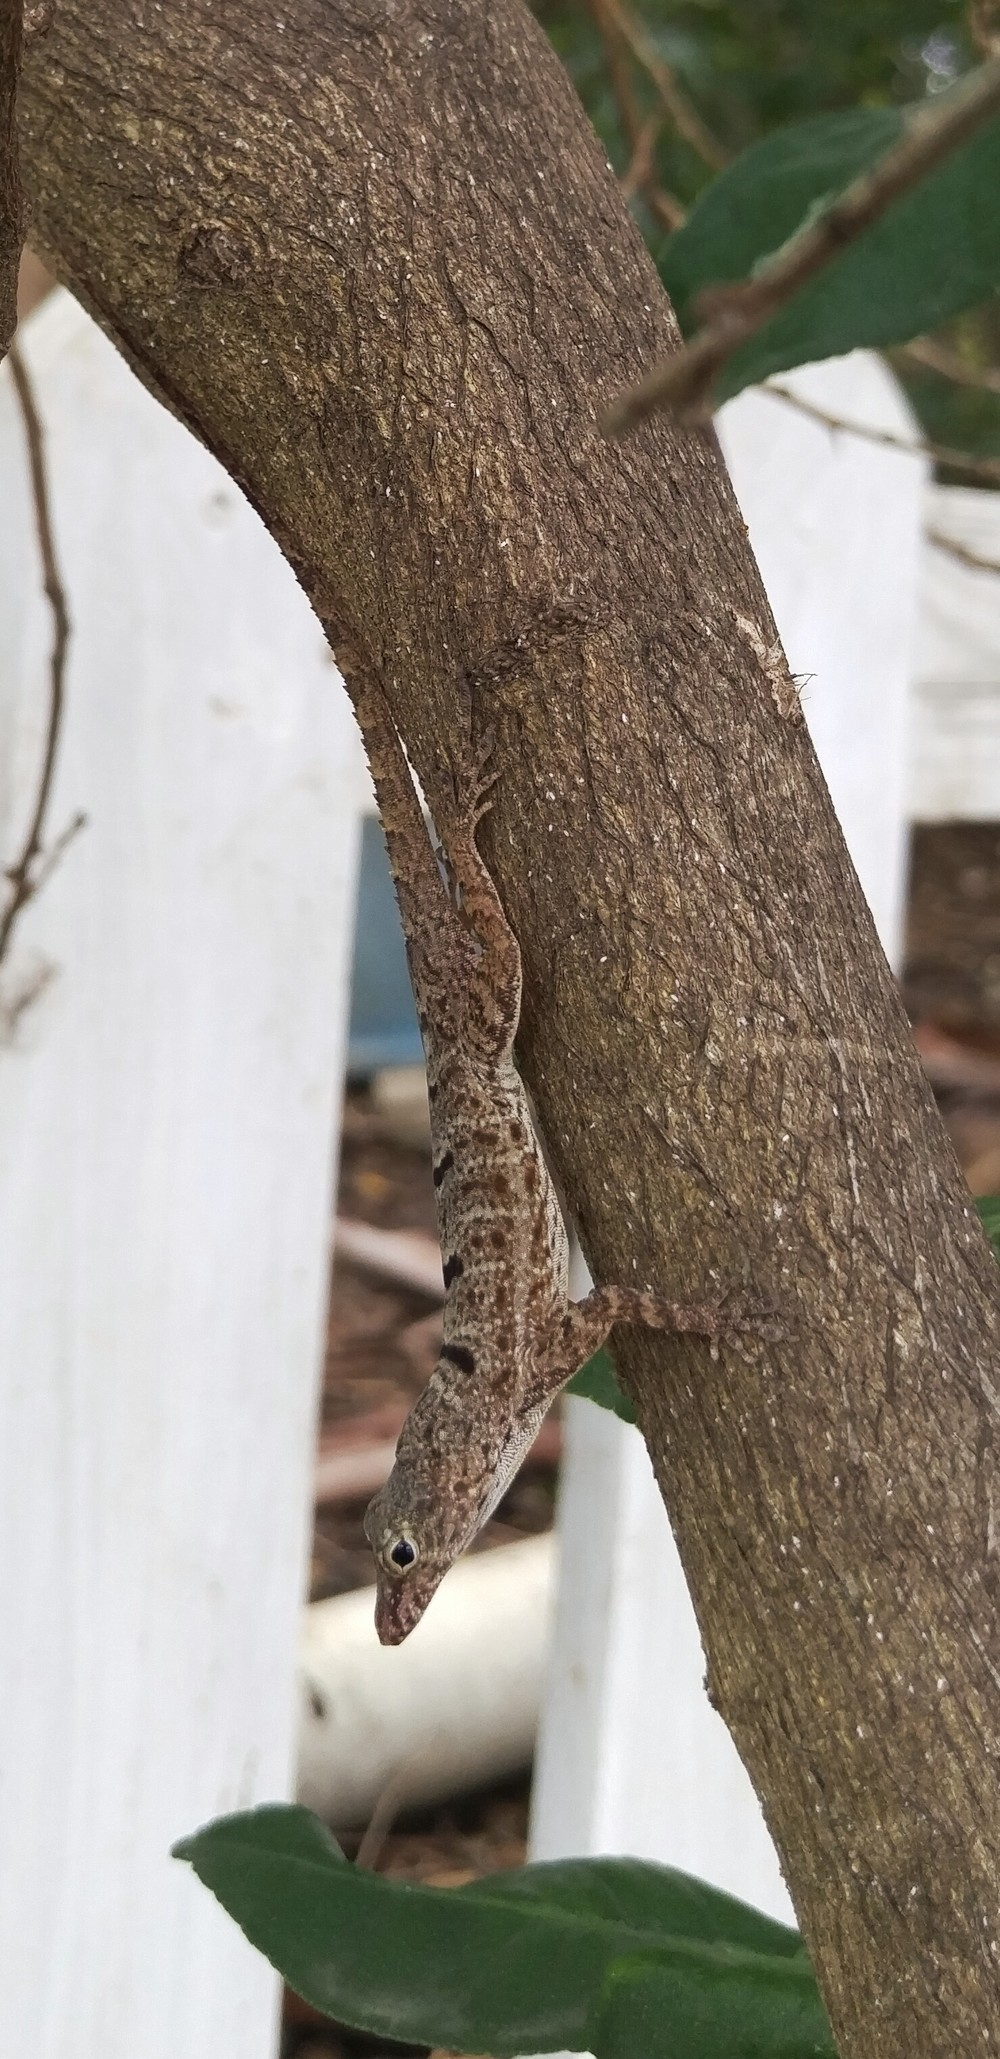 Ctenonotus stratulus, Culebra